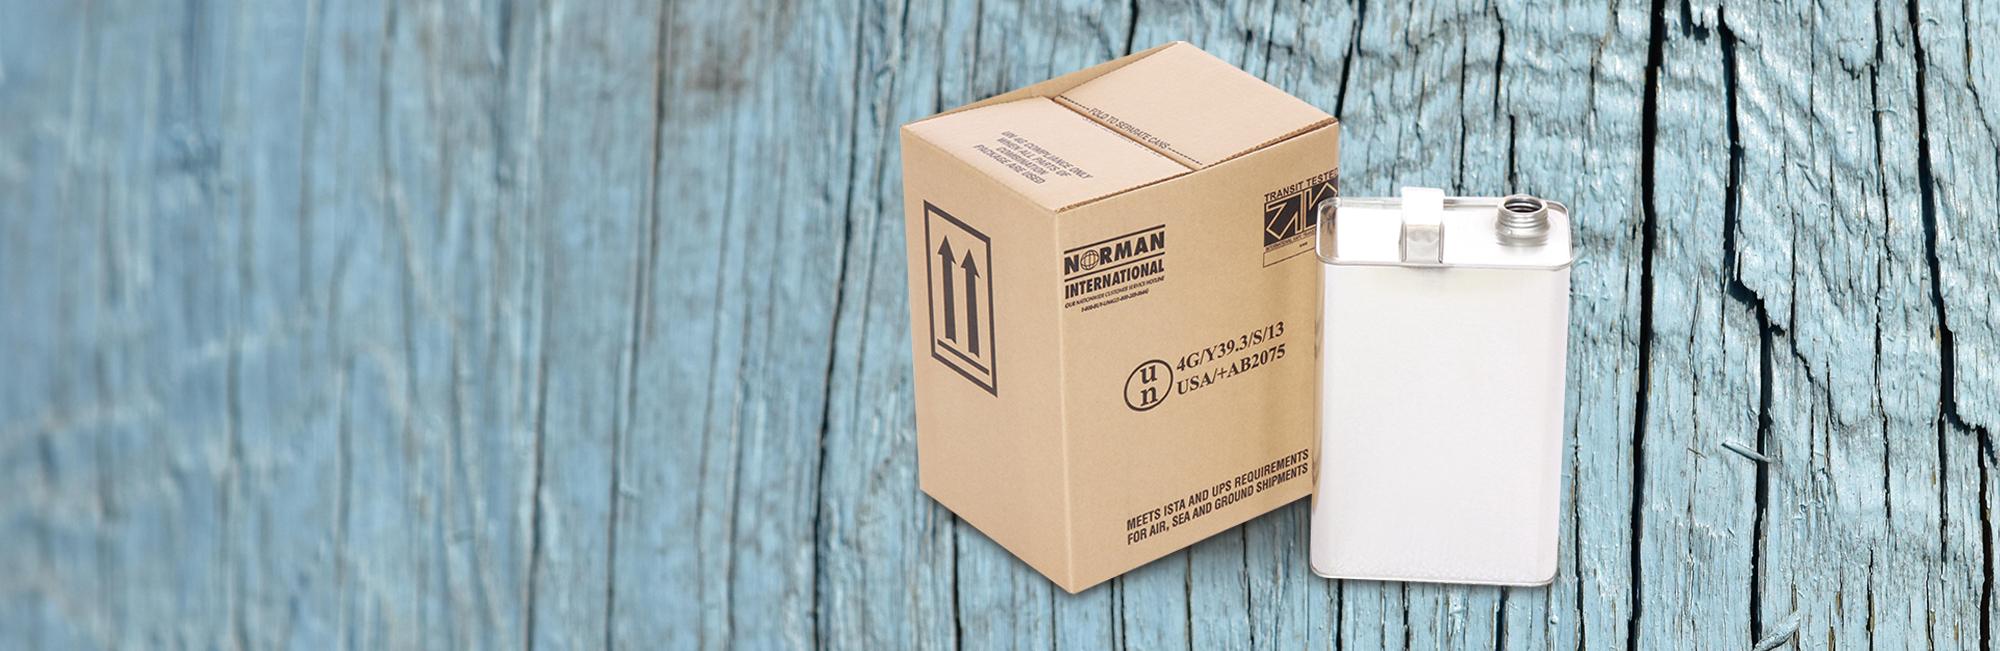 UN4G Cartons